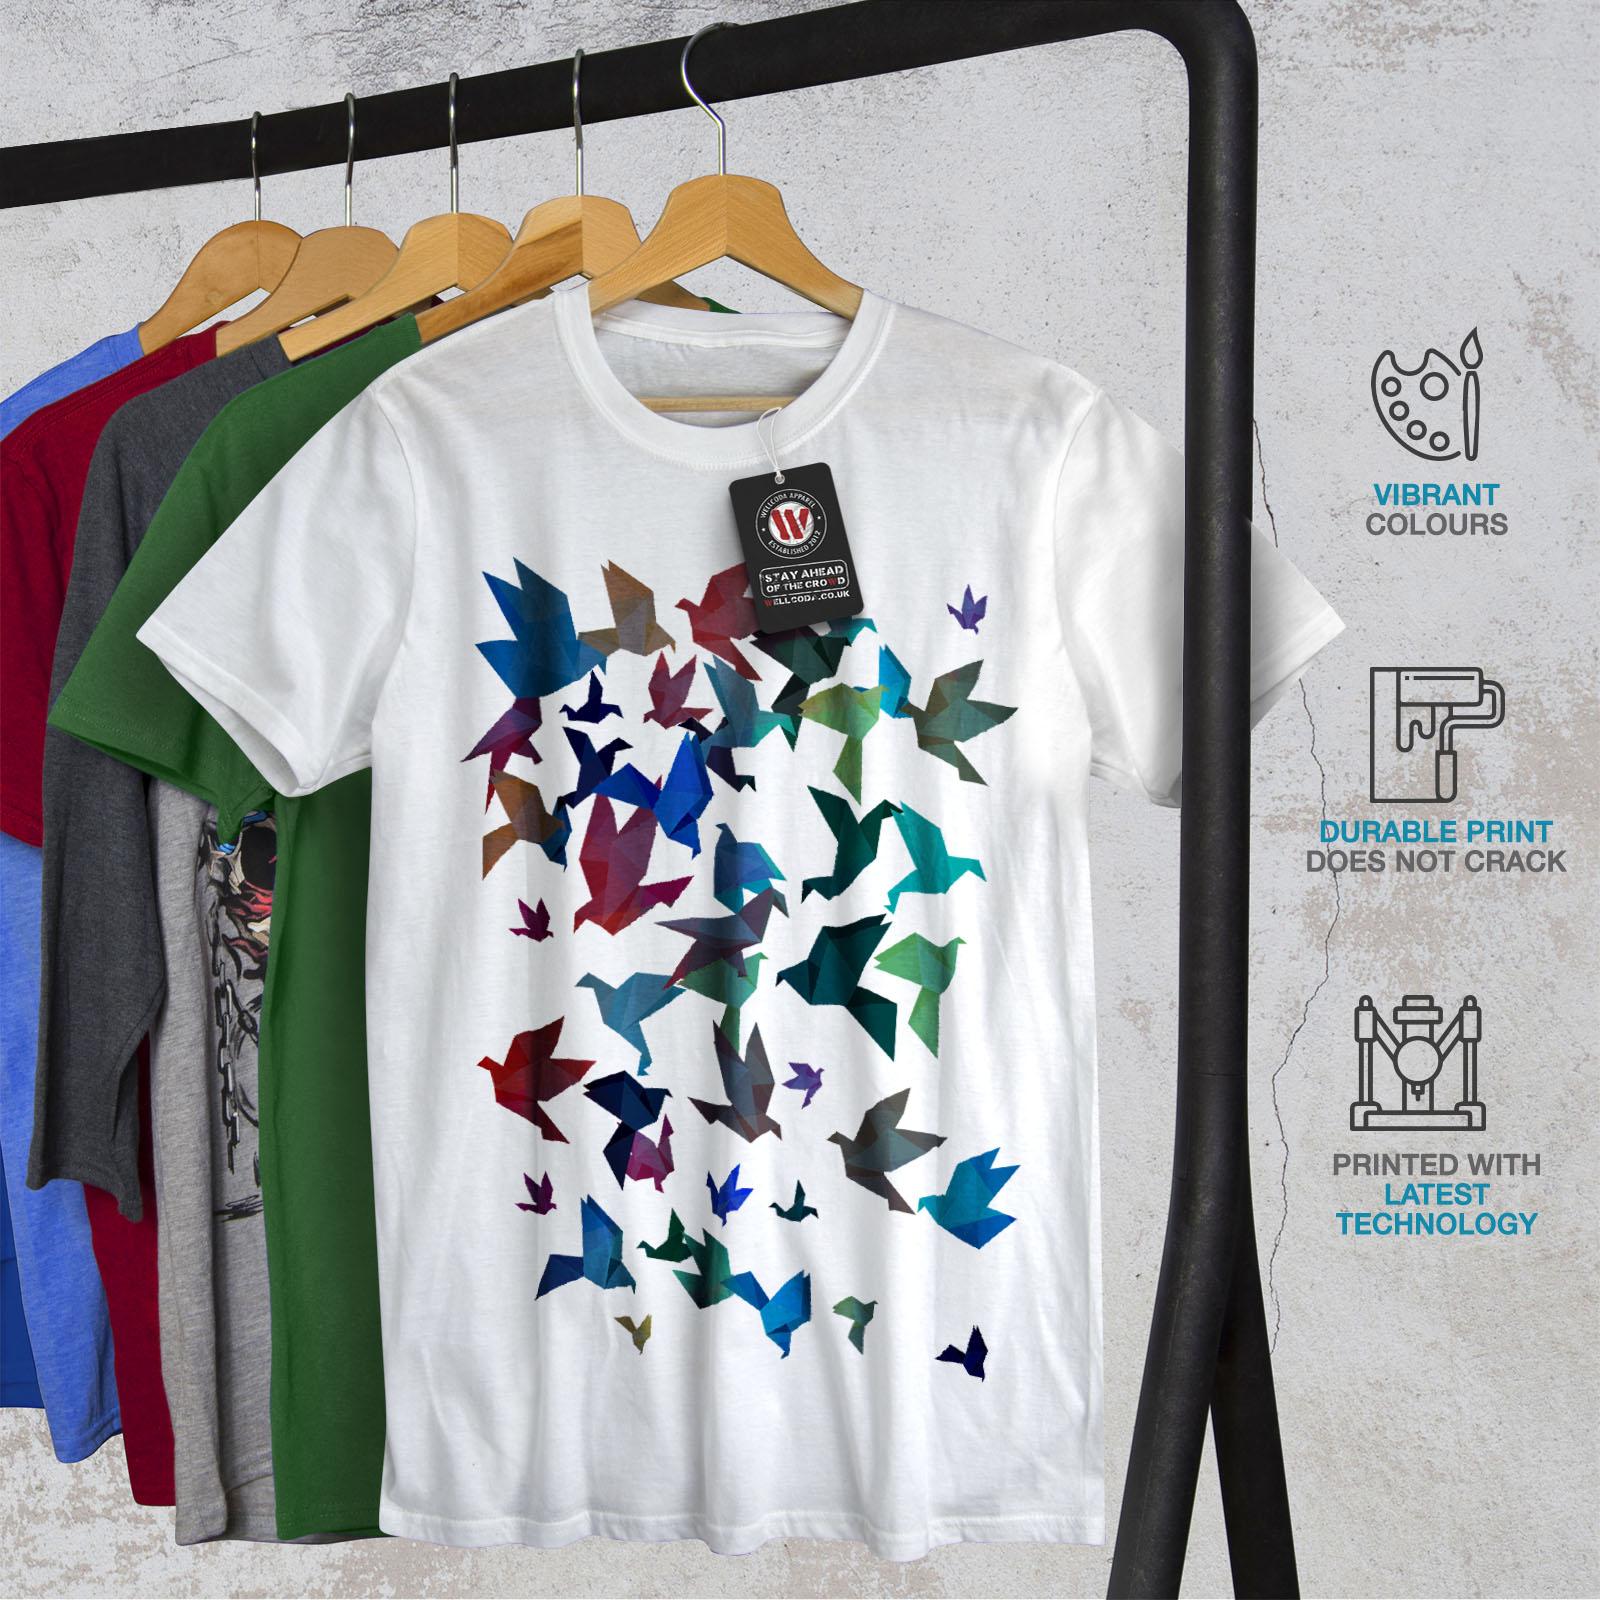 Wellcoda-Origami-Bird-Colors-Mens-T-shirt-Craft-Graphic-Design-Printed-Tee thumbnail 12